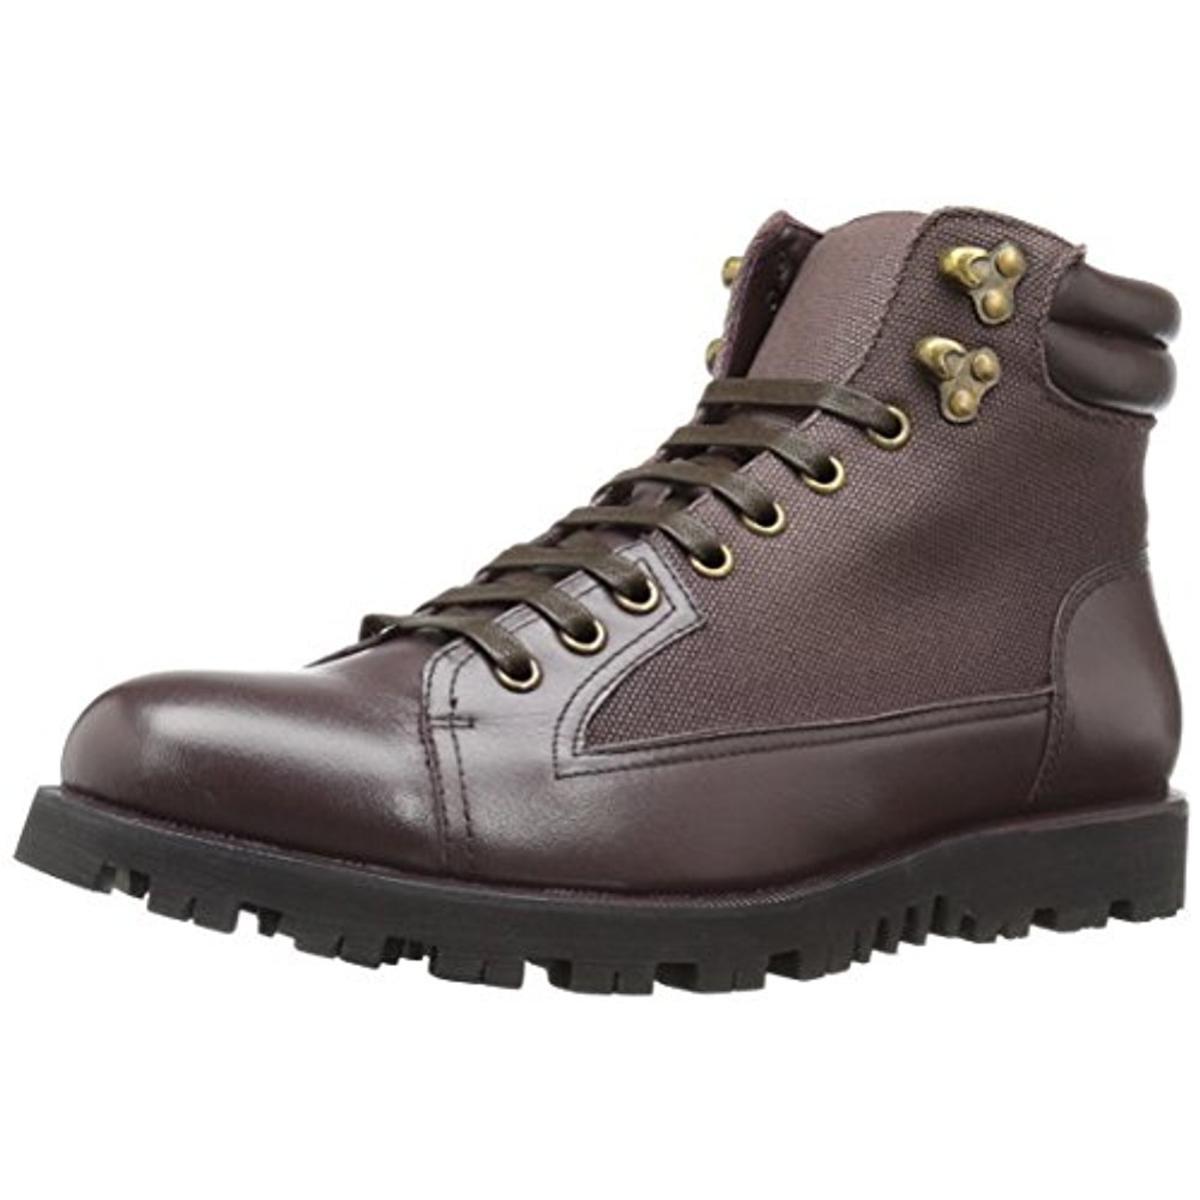 Zanzara Mens Cremona Leather Textured Ankle Boots